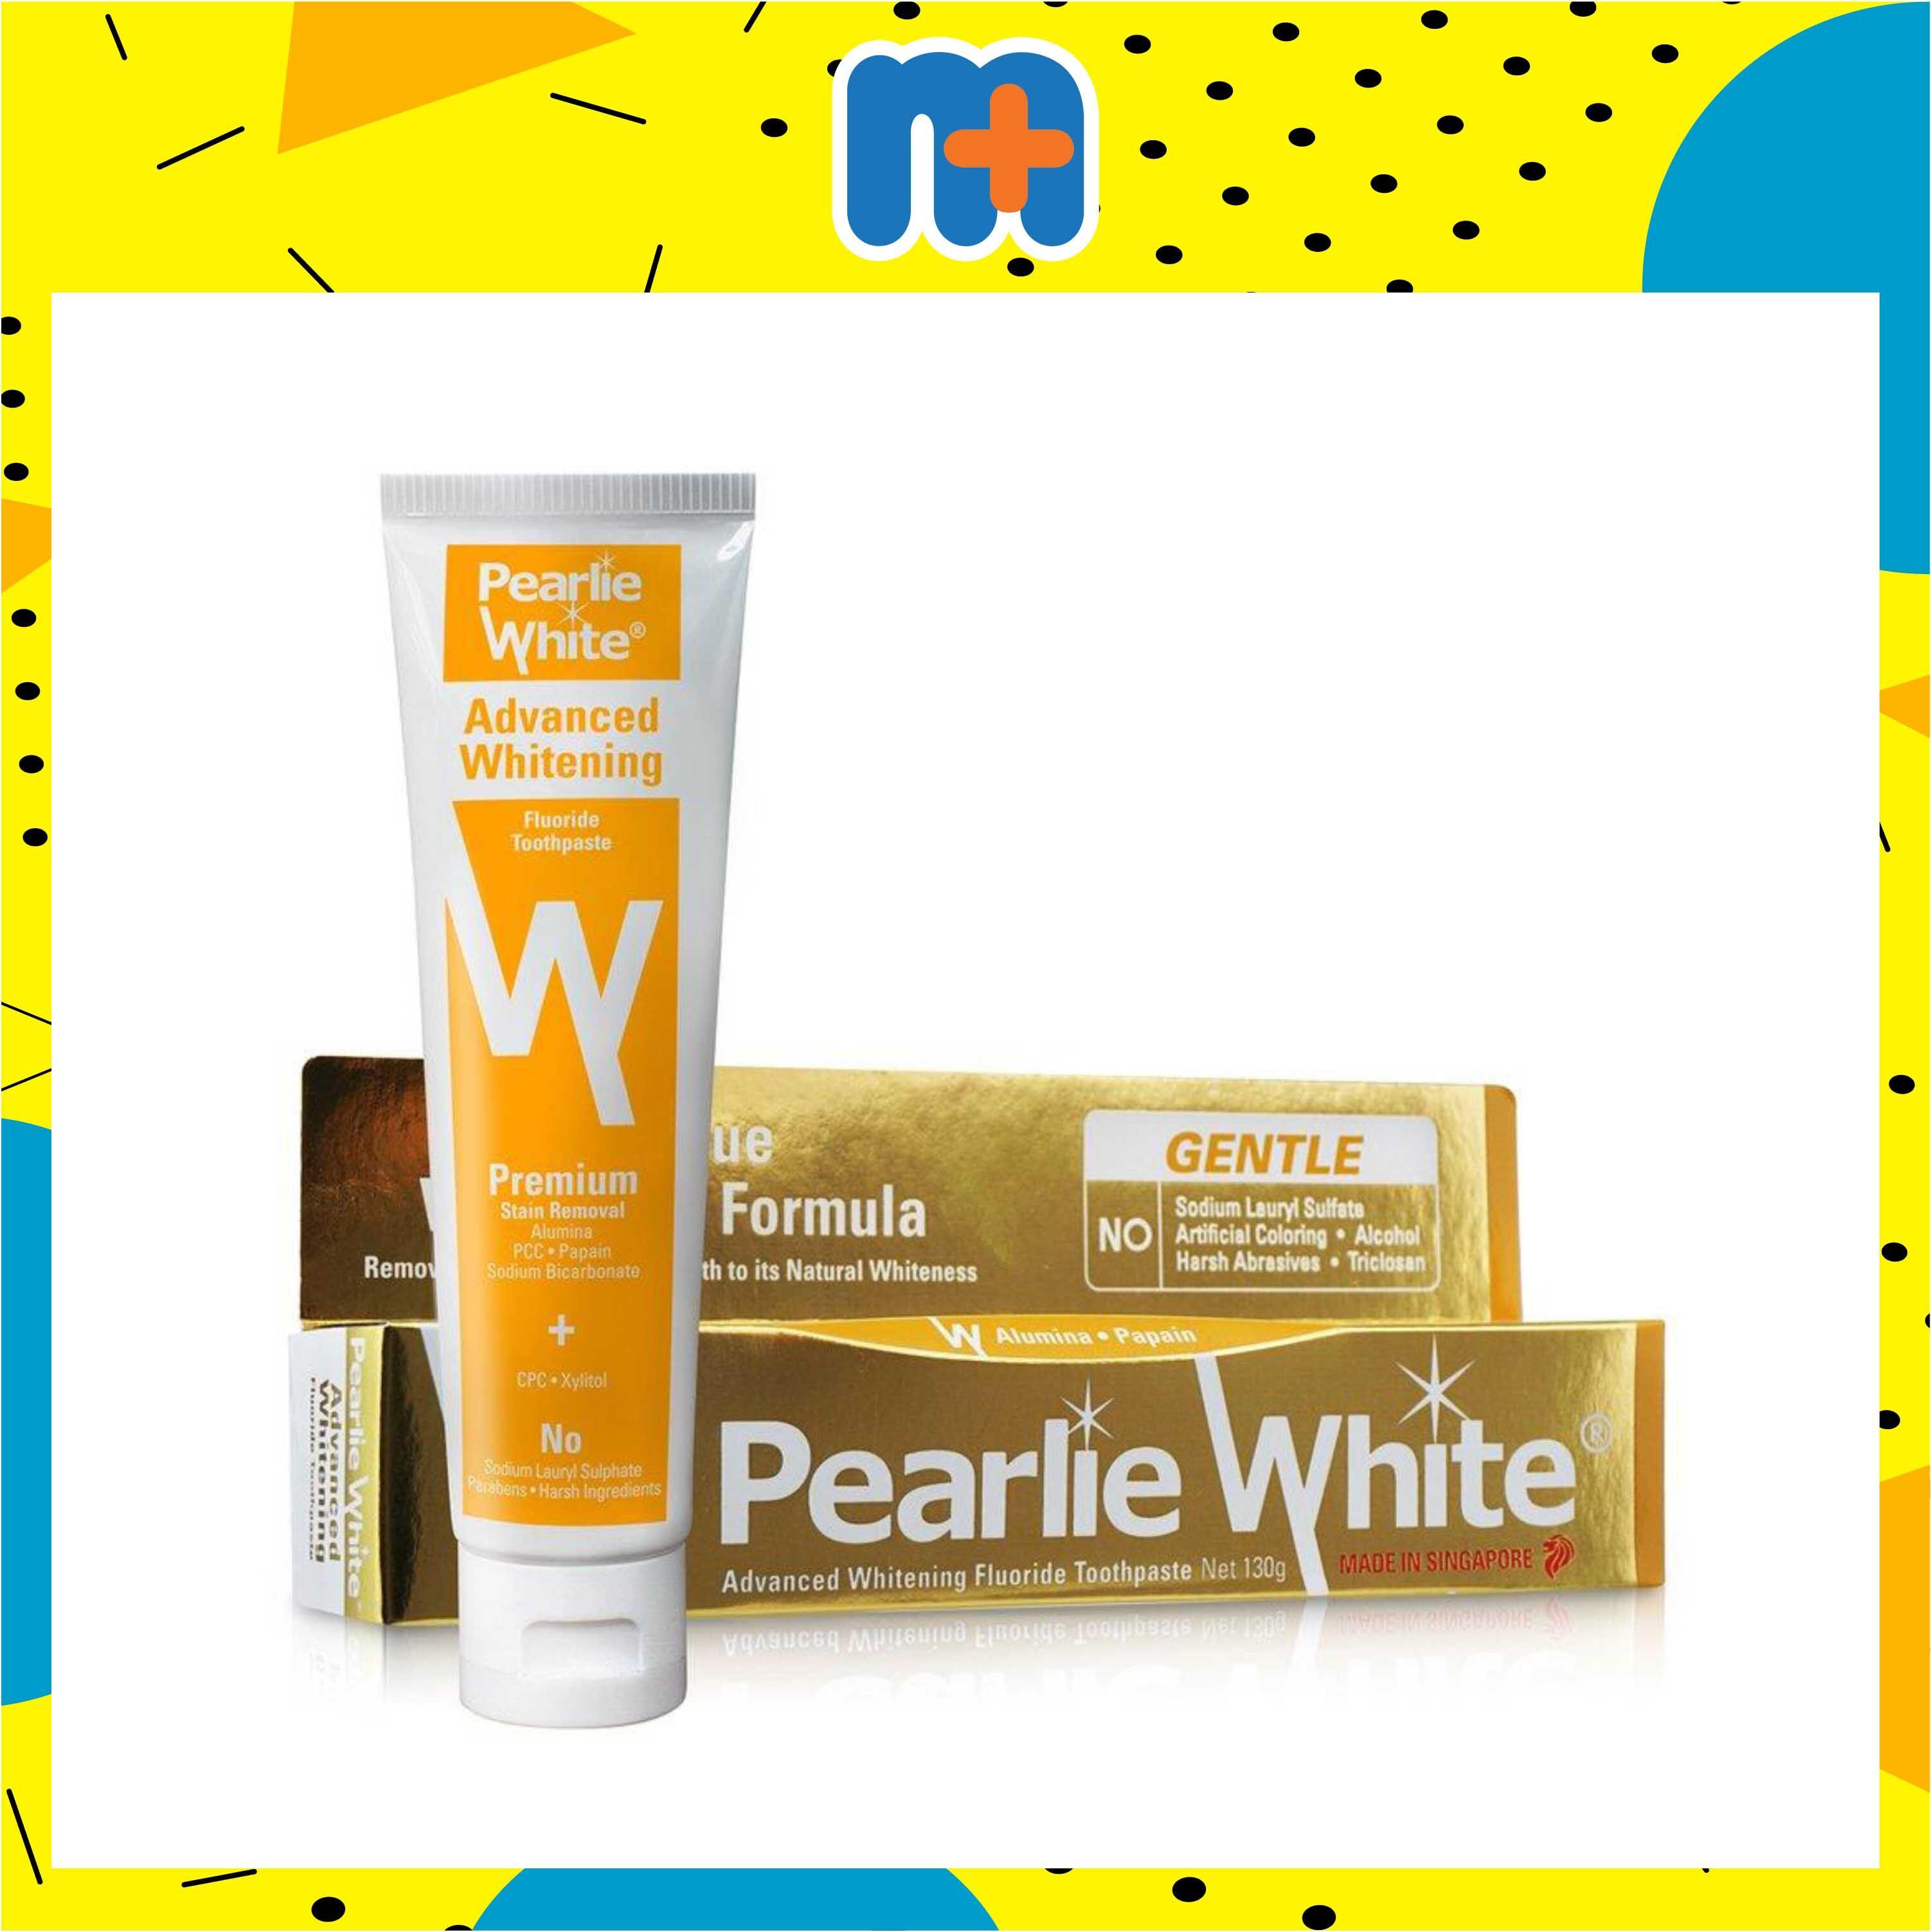 [MPLUS] PEARLIE WHITE WHITENING FLUORIDE TOOTHPASTE 130G